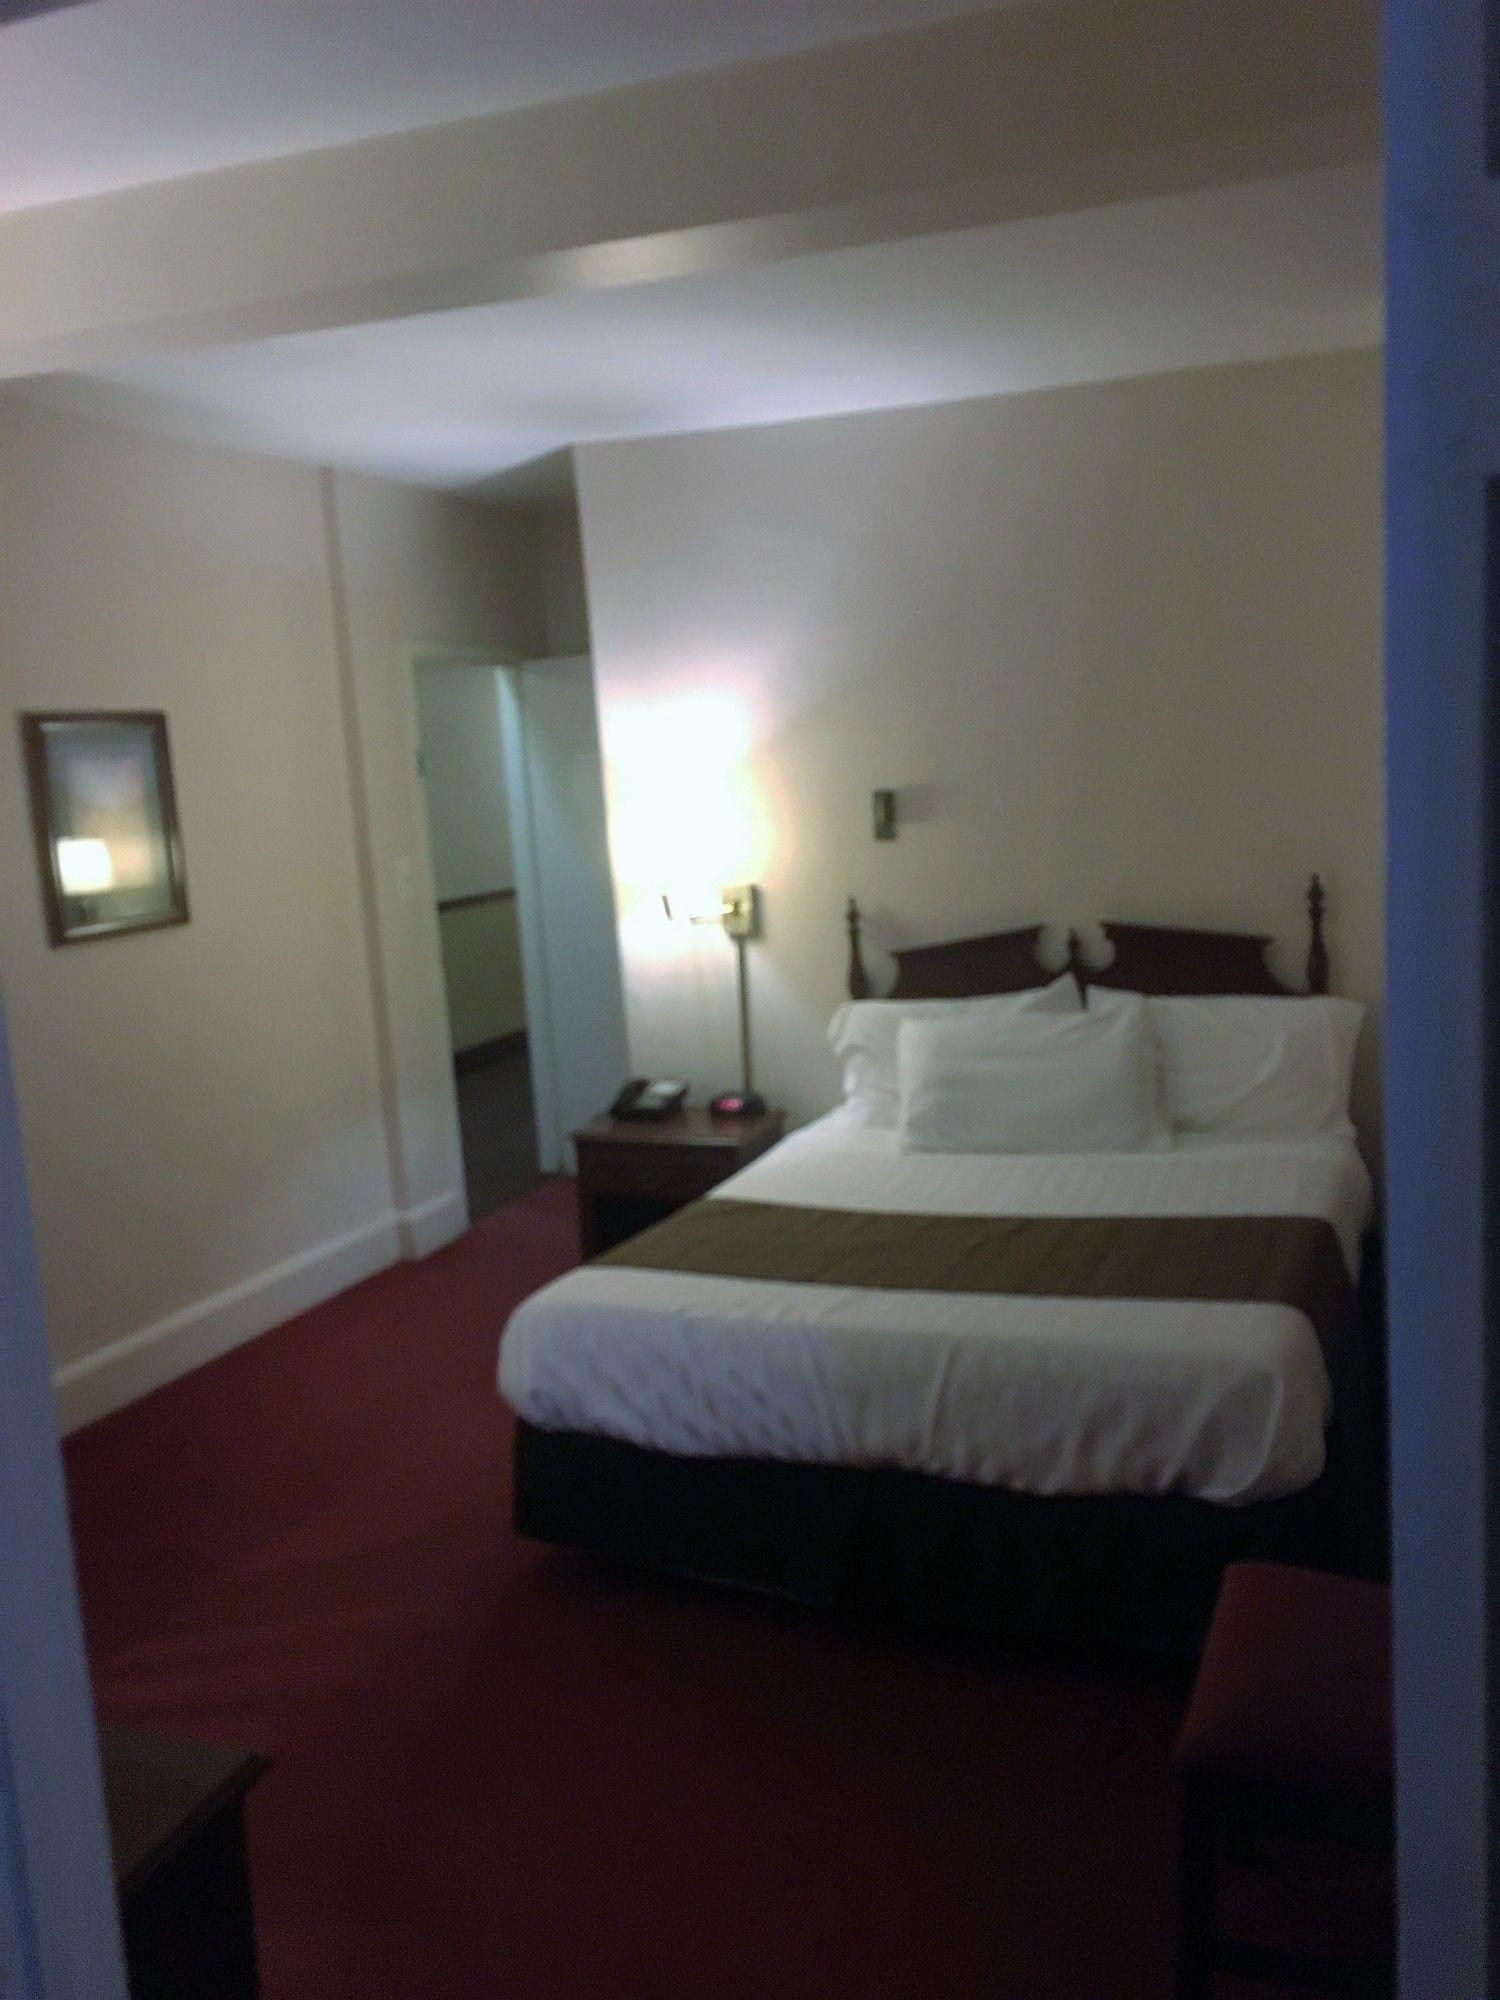 Washington Hotel Coupons for Washington DC FreeHotelCoupons